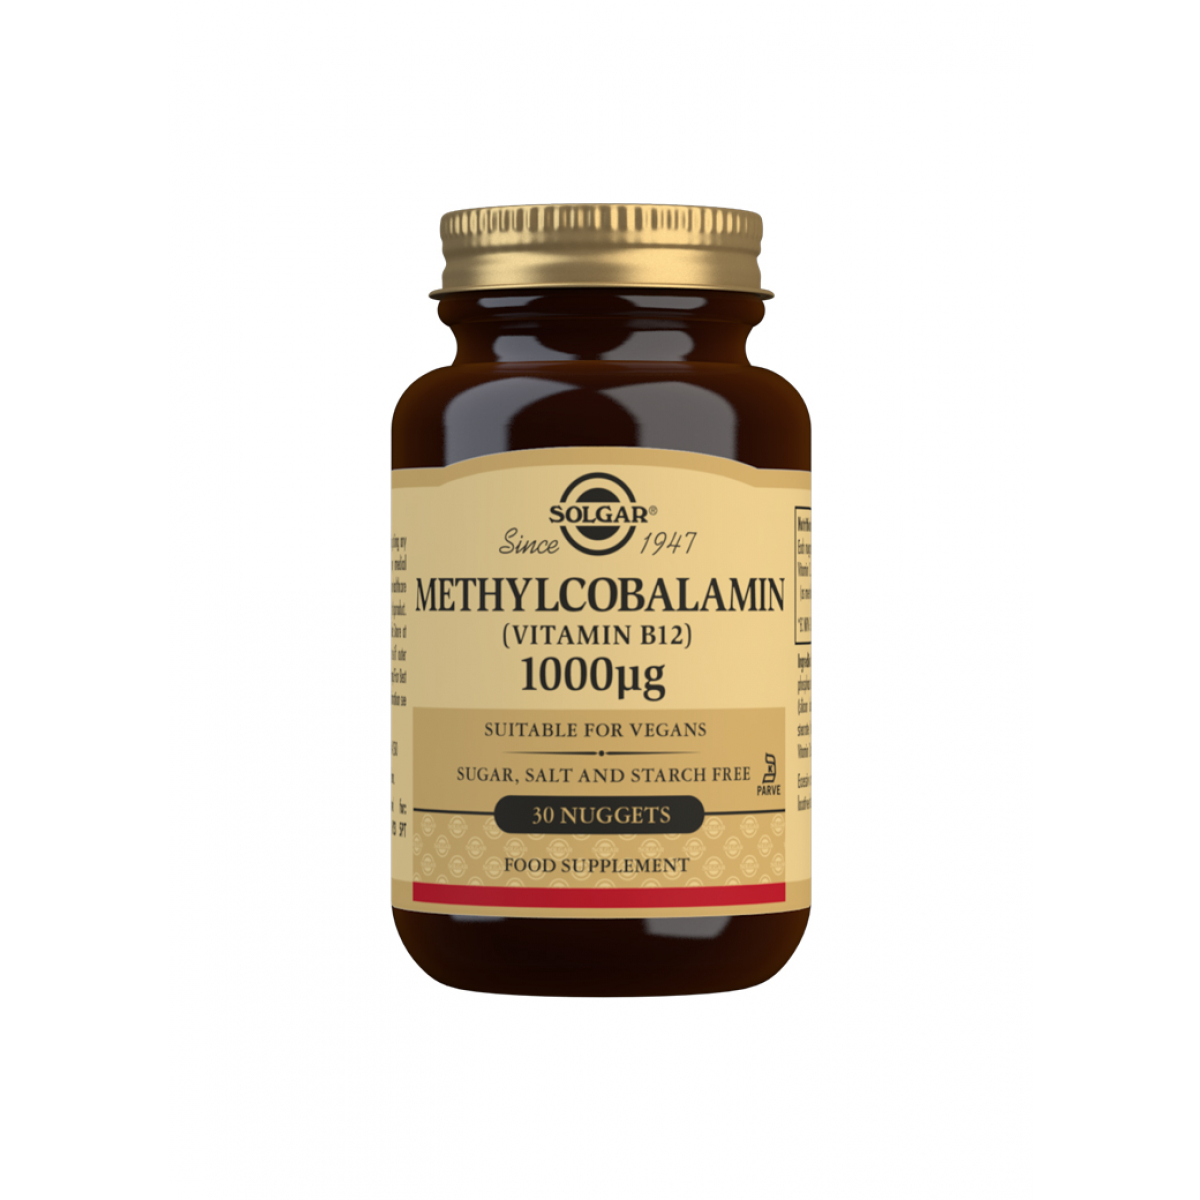 Solgar Methylcobolamin 1000 µg *30 Caps